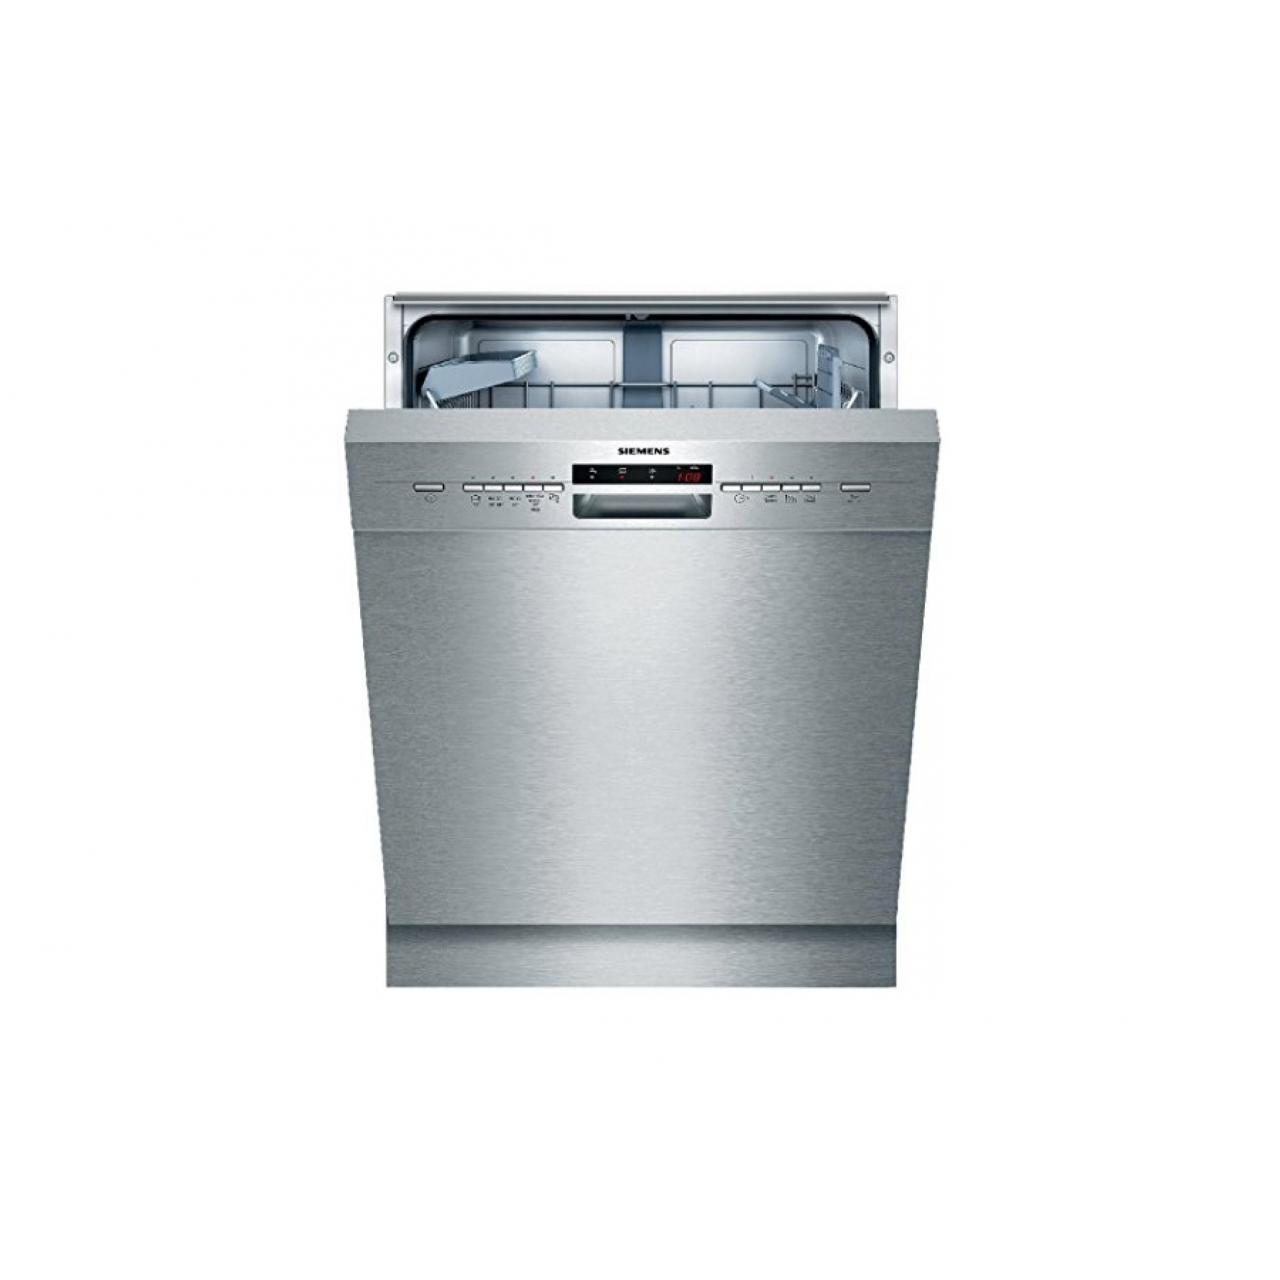 Vollintegrierte Spulmaschine Bosch Smz2055 Voll Edelstahlfront